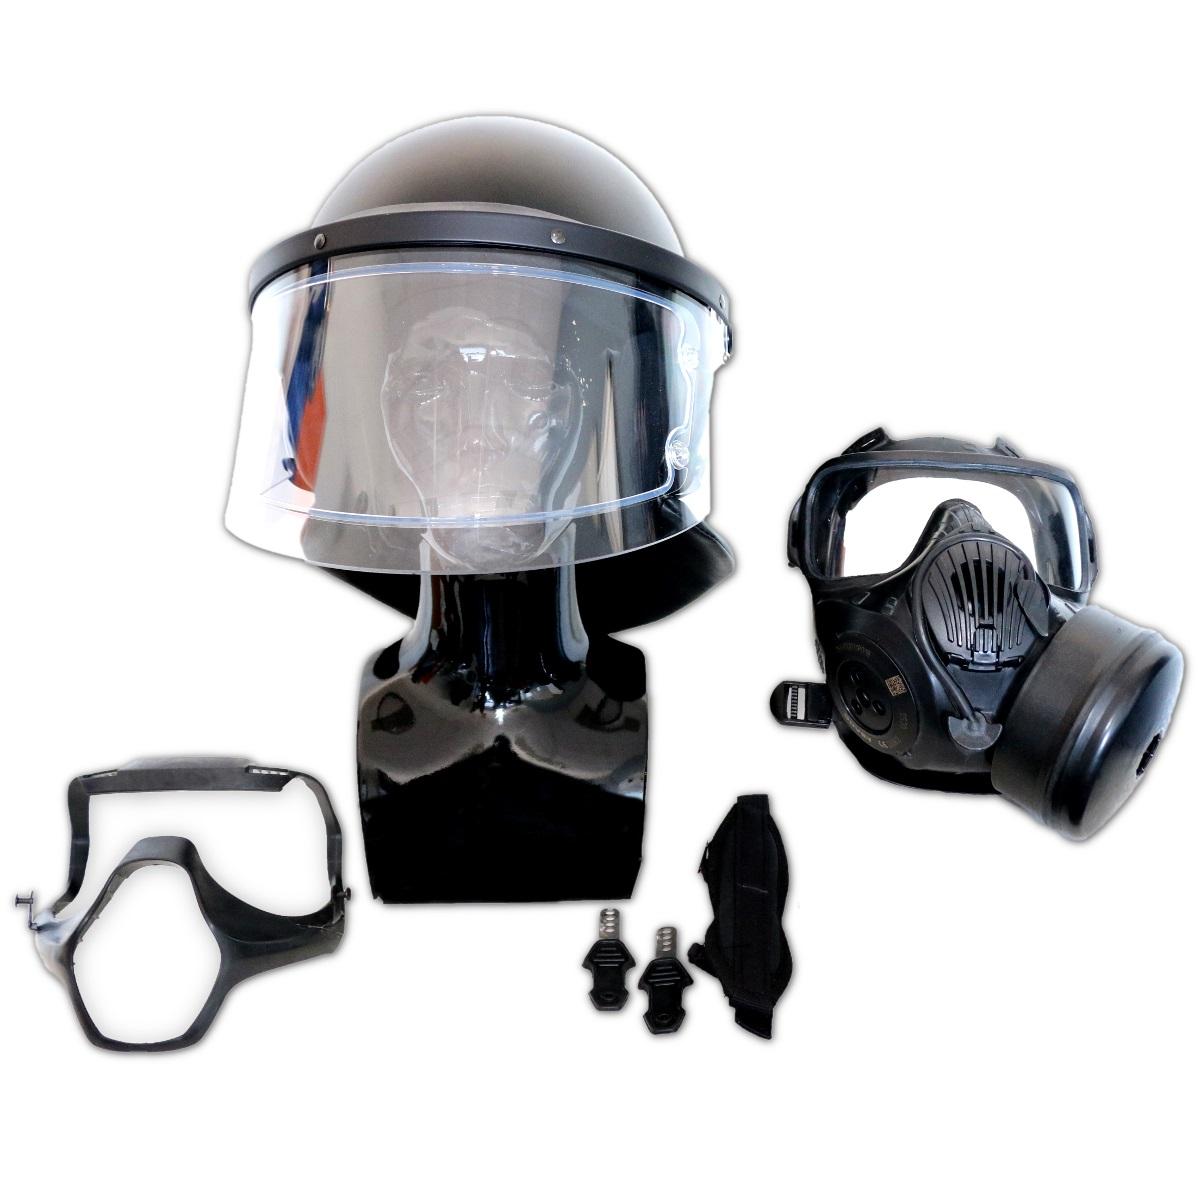 Helmet interface for law enforcement